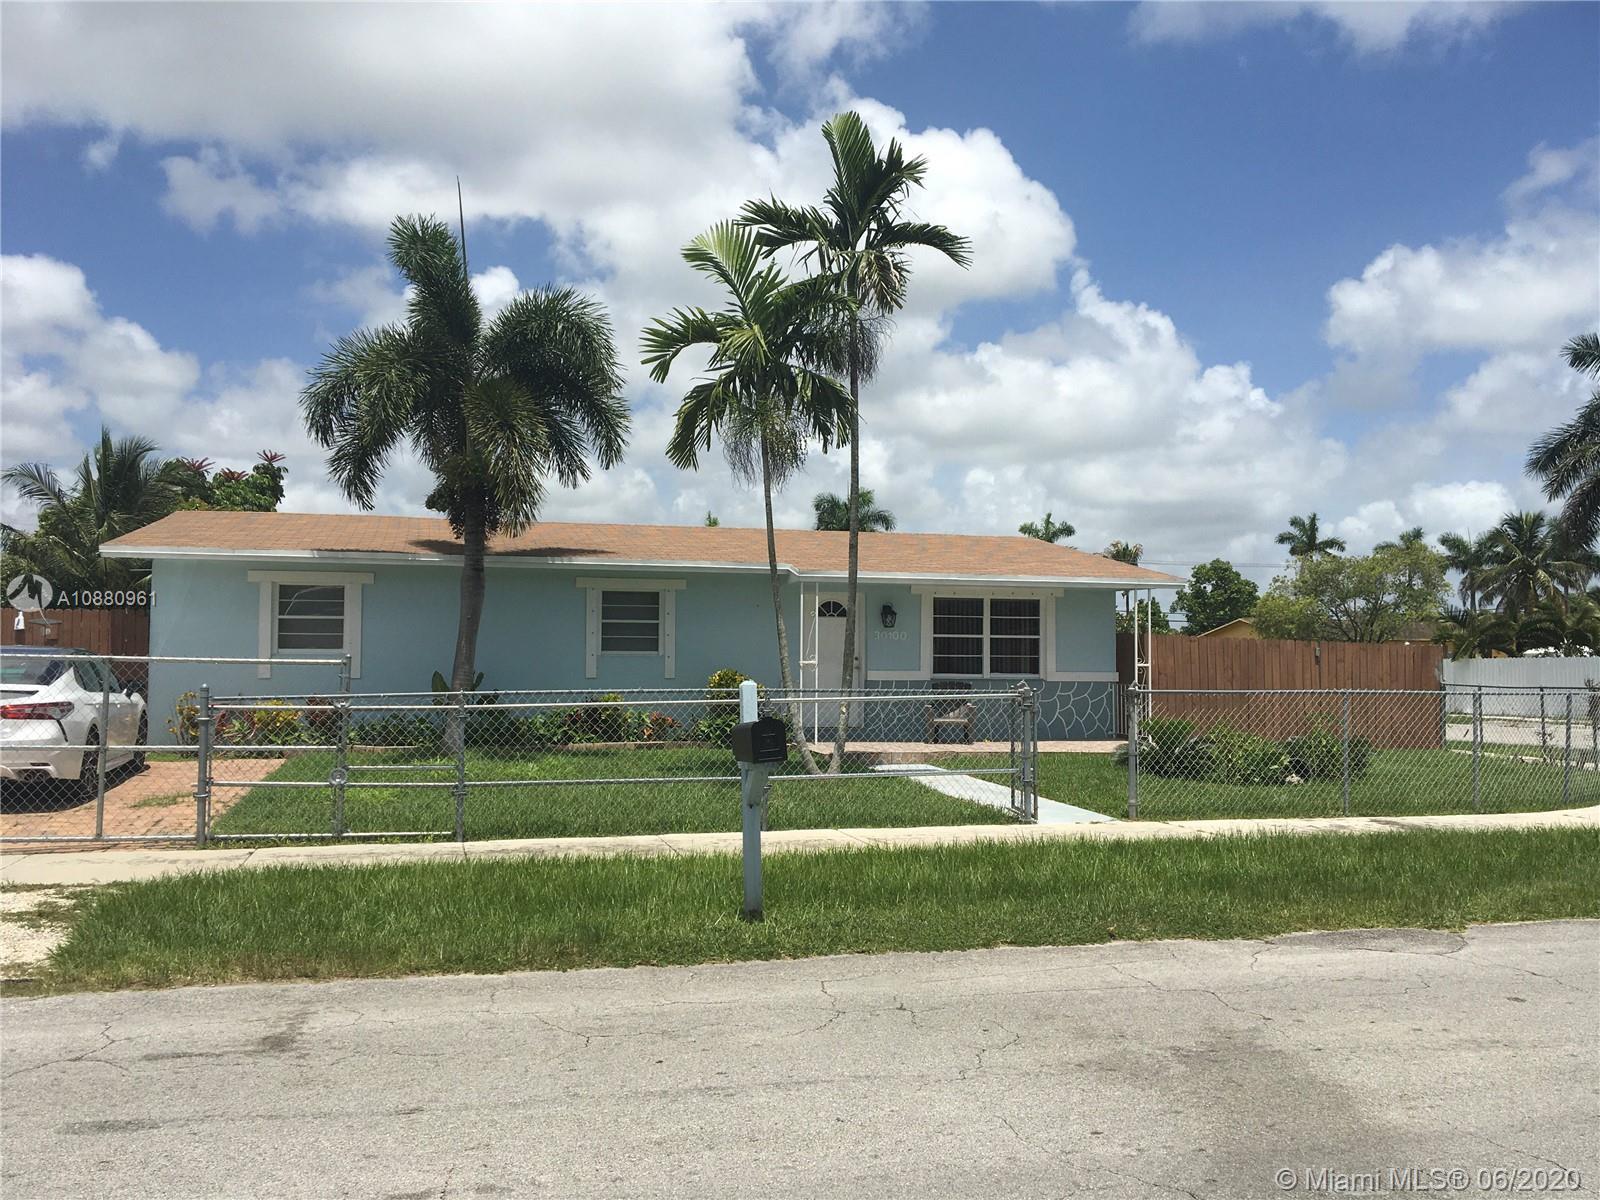 30100 SW 151st Ave Property Photo